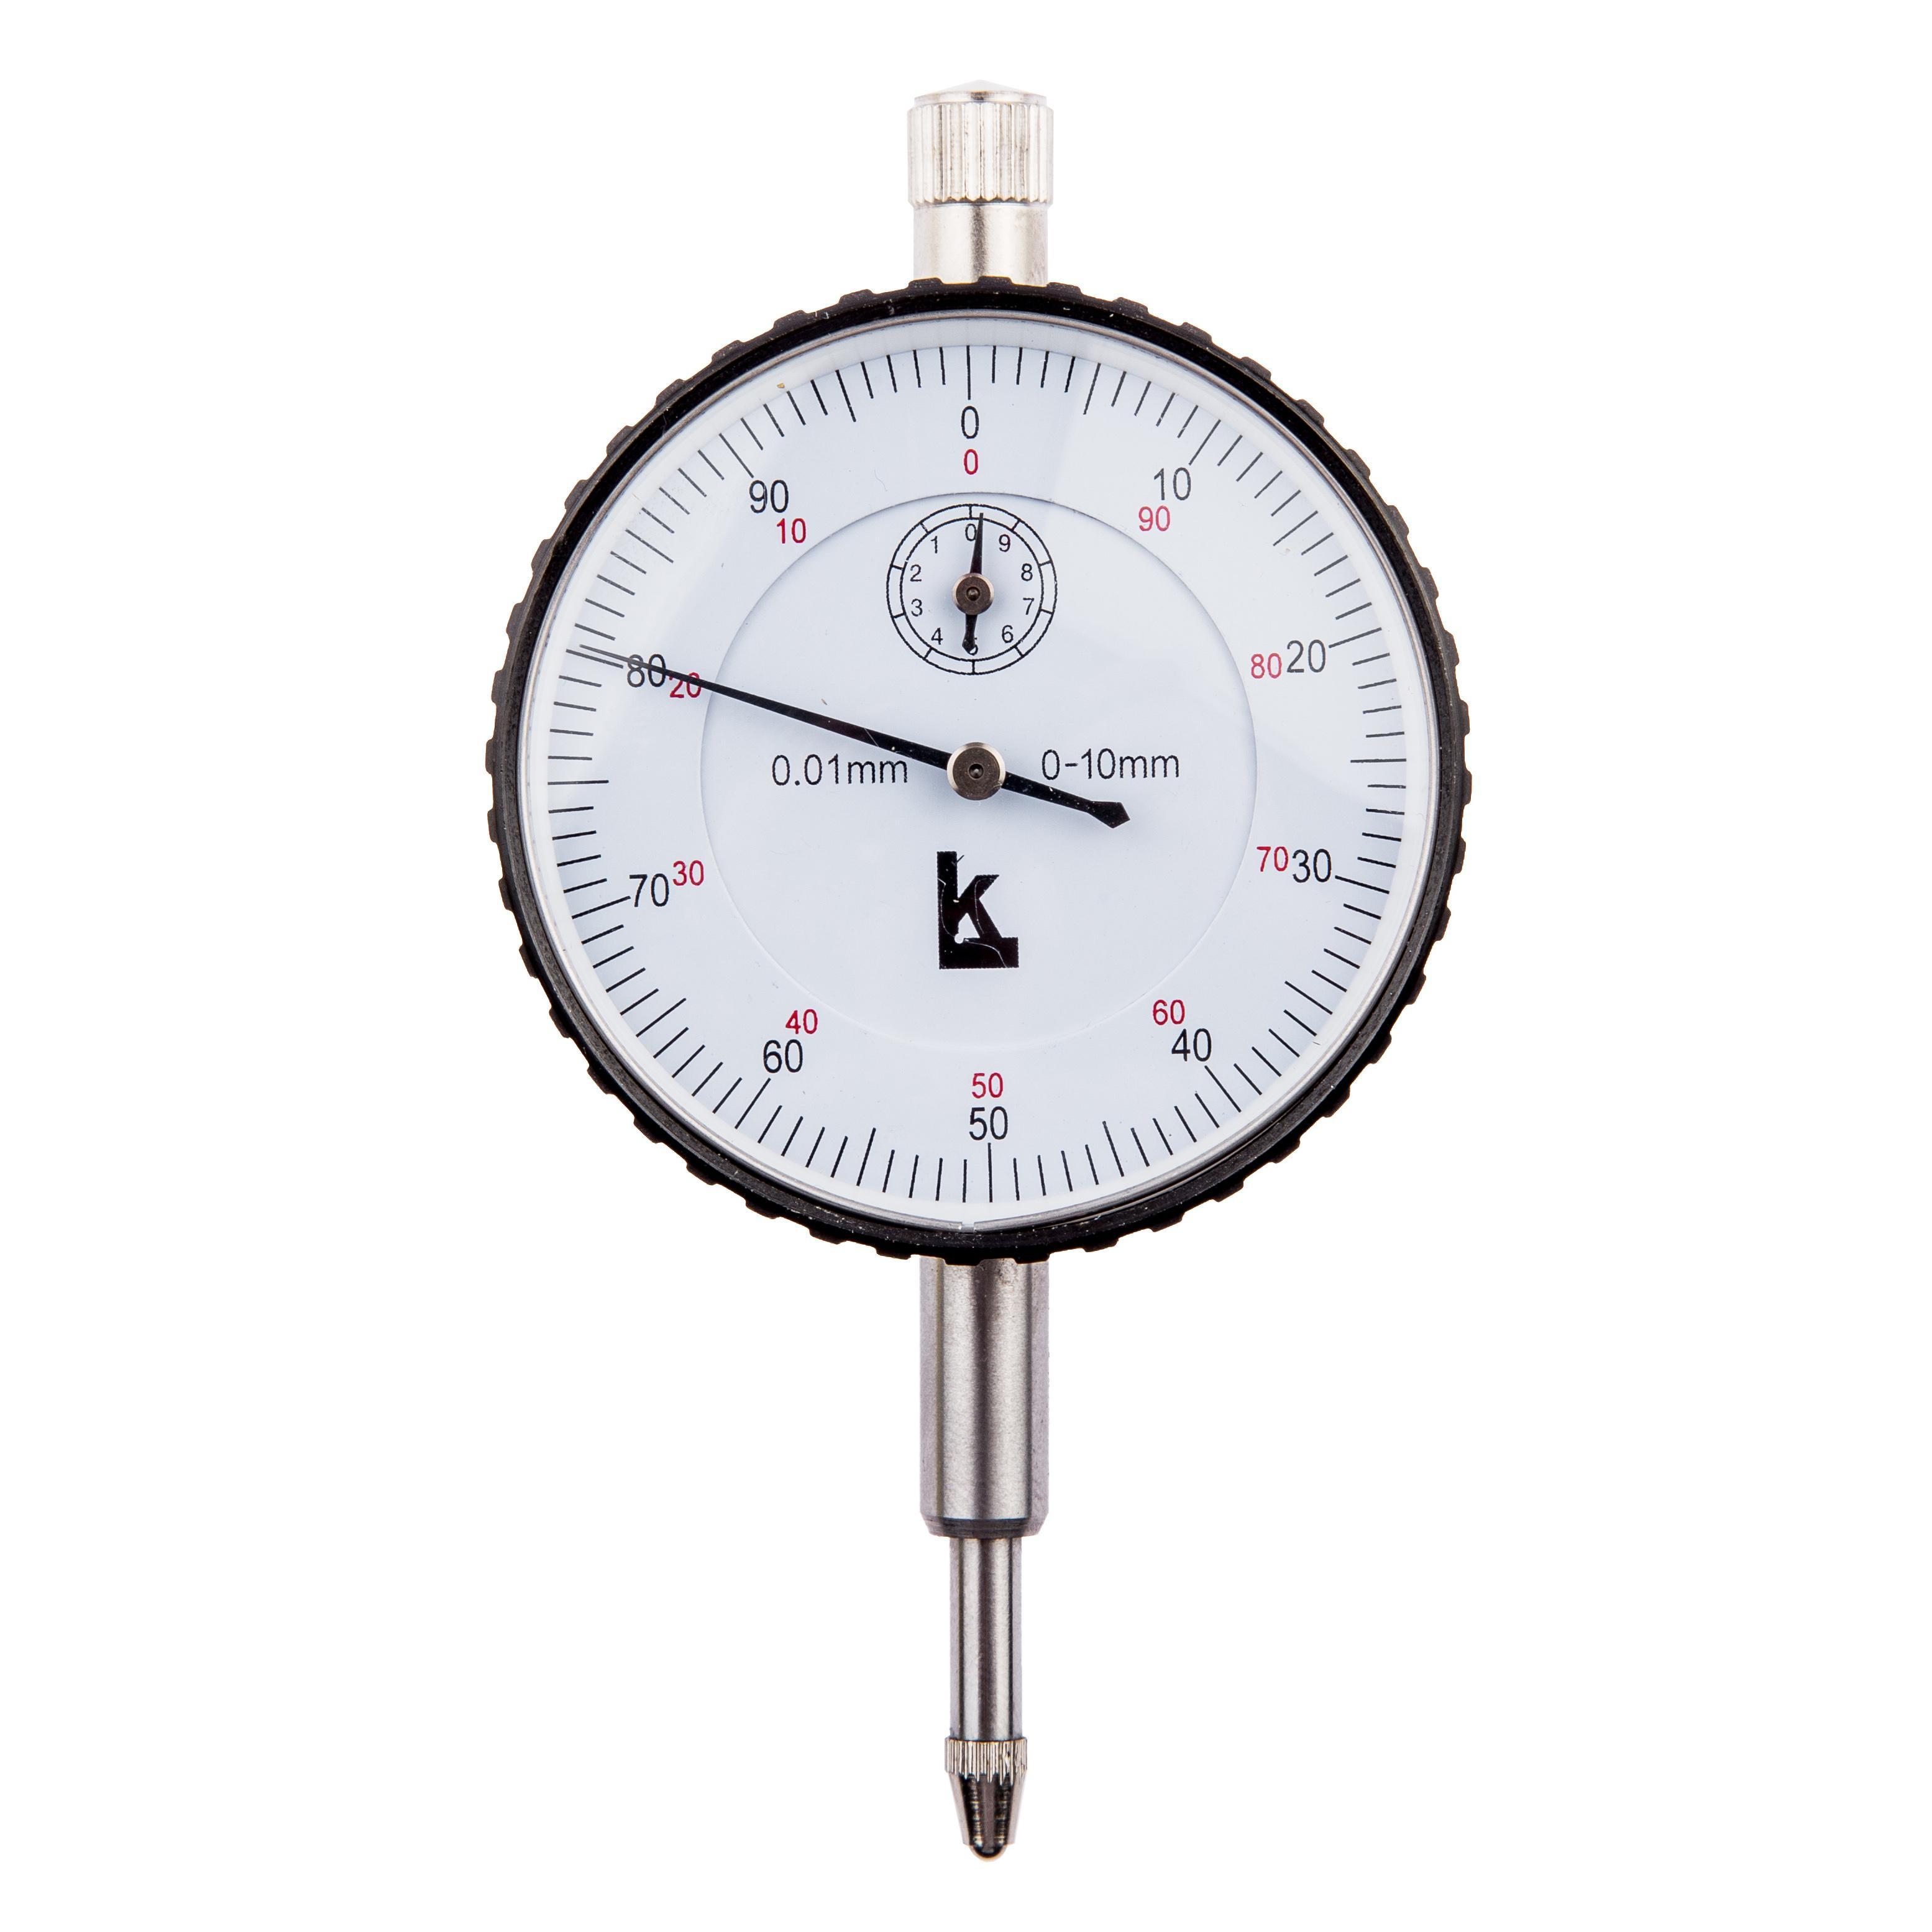 Индикатор ЧИЗ час.типа 0-10 0.01 б/уш.